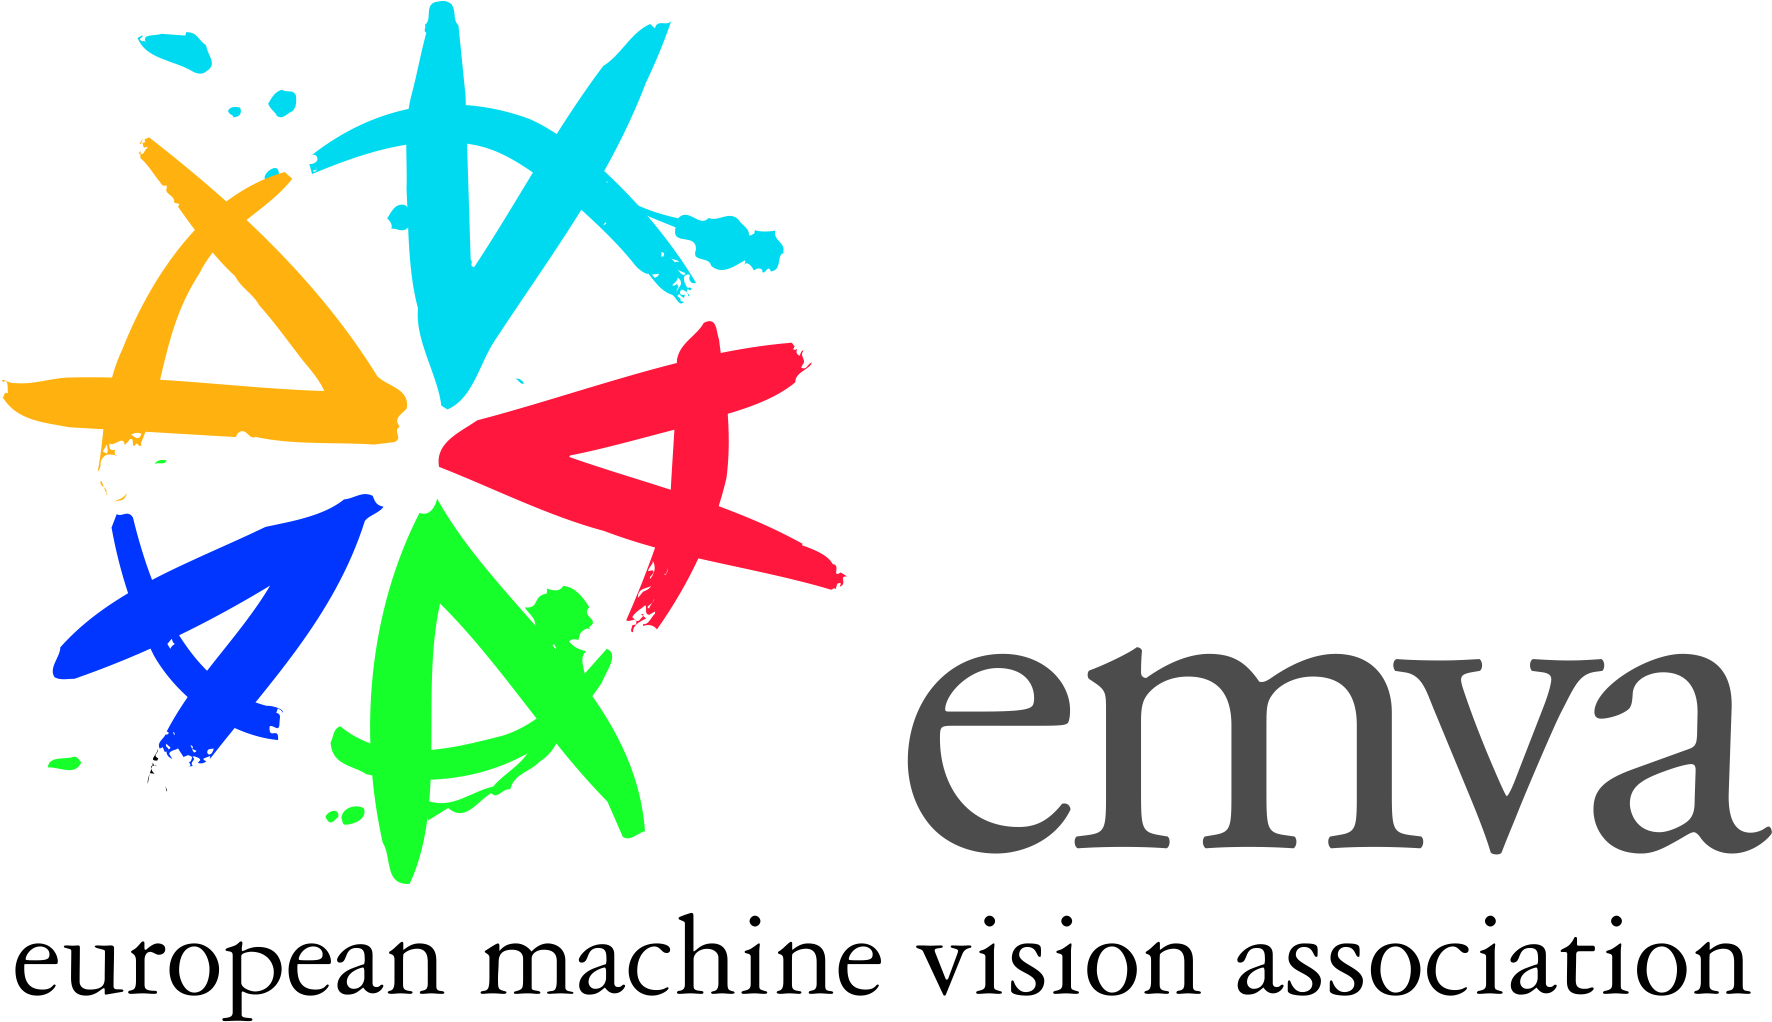 EMVA European Machine Vision Association